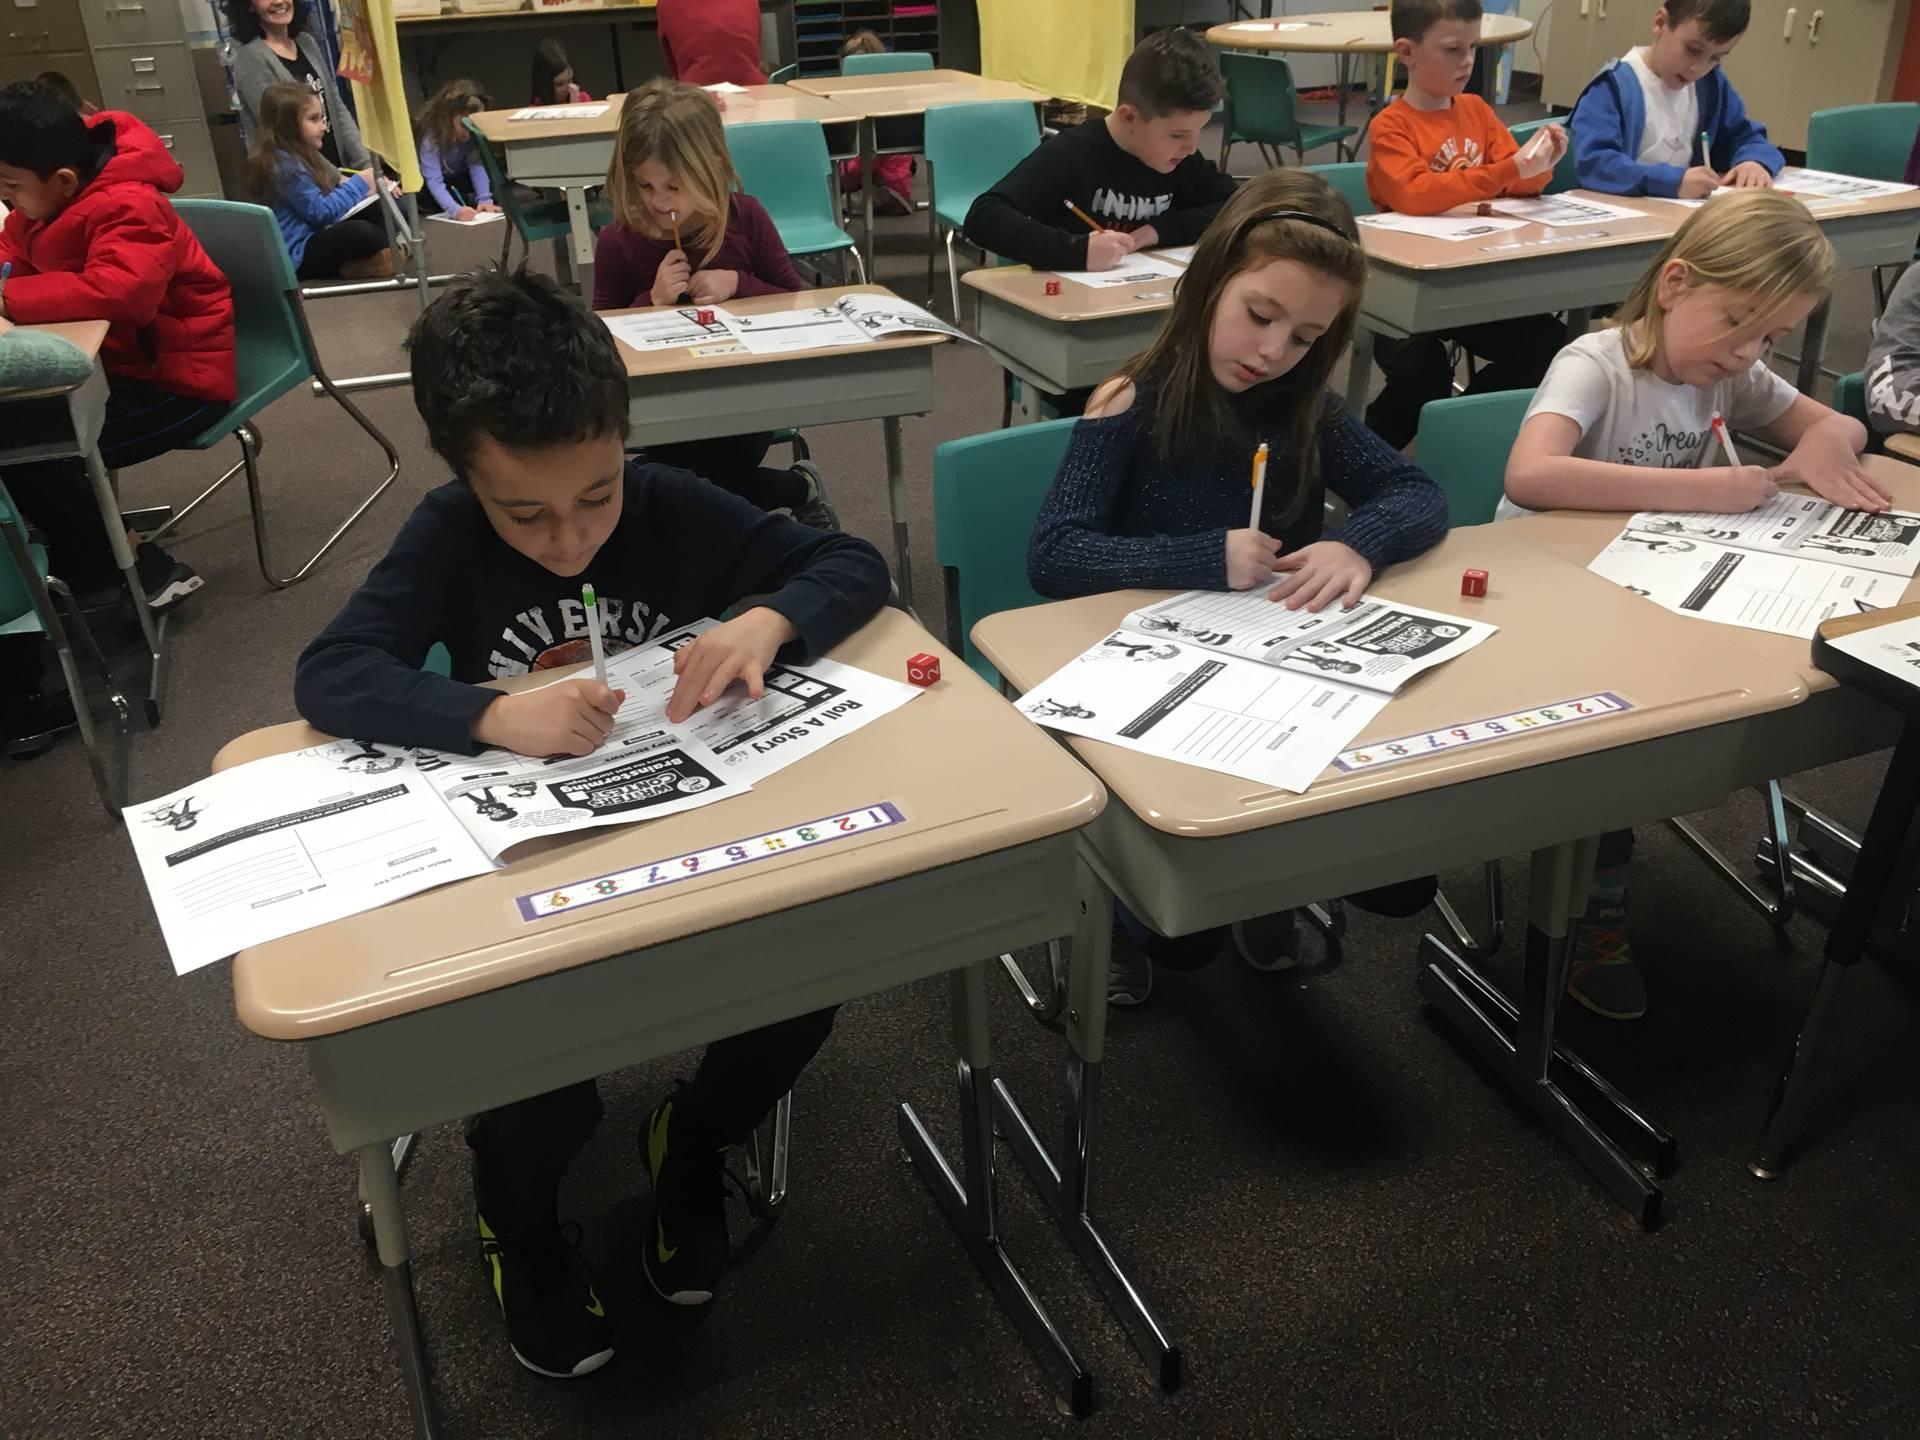 Three students working at desks